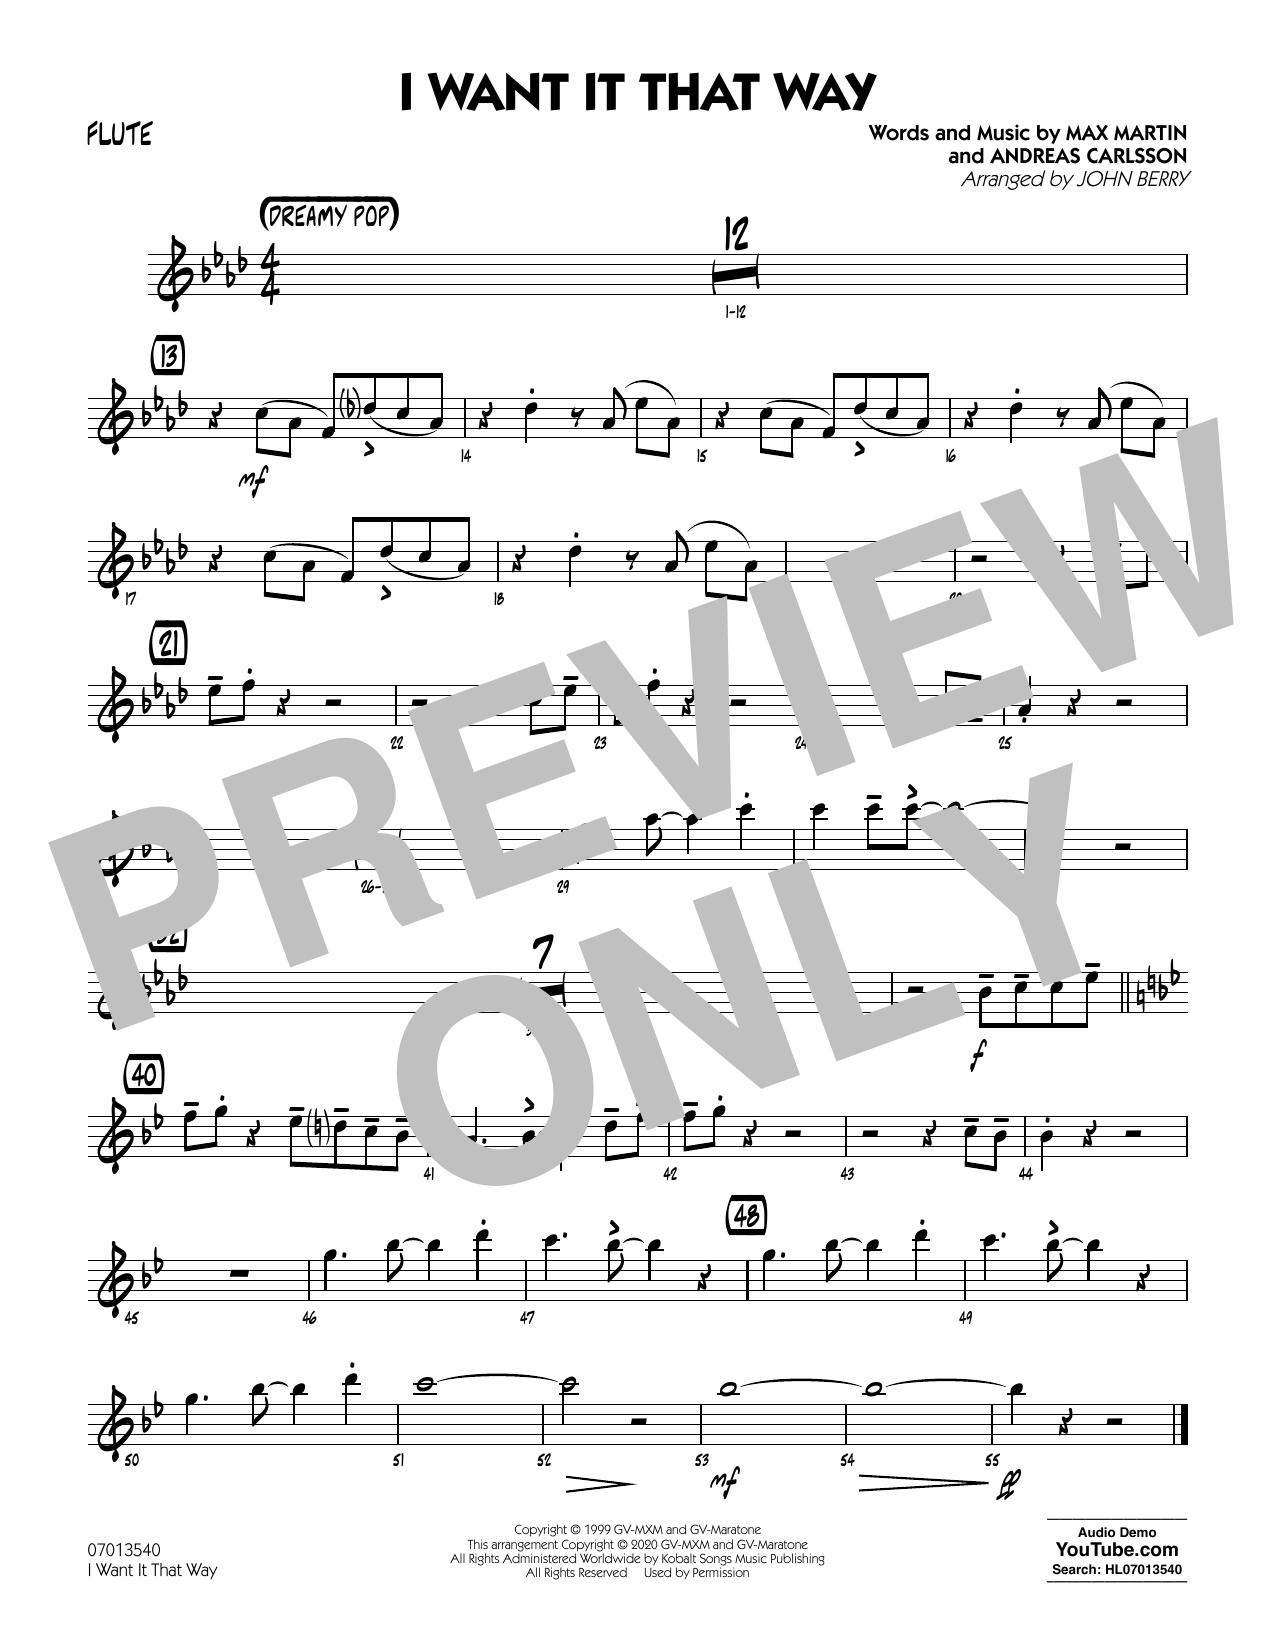 I Want It That Way (arr. John Berry) - Flute Sheet Music